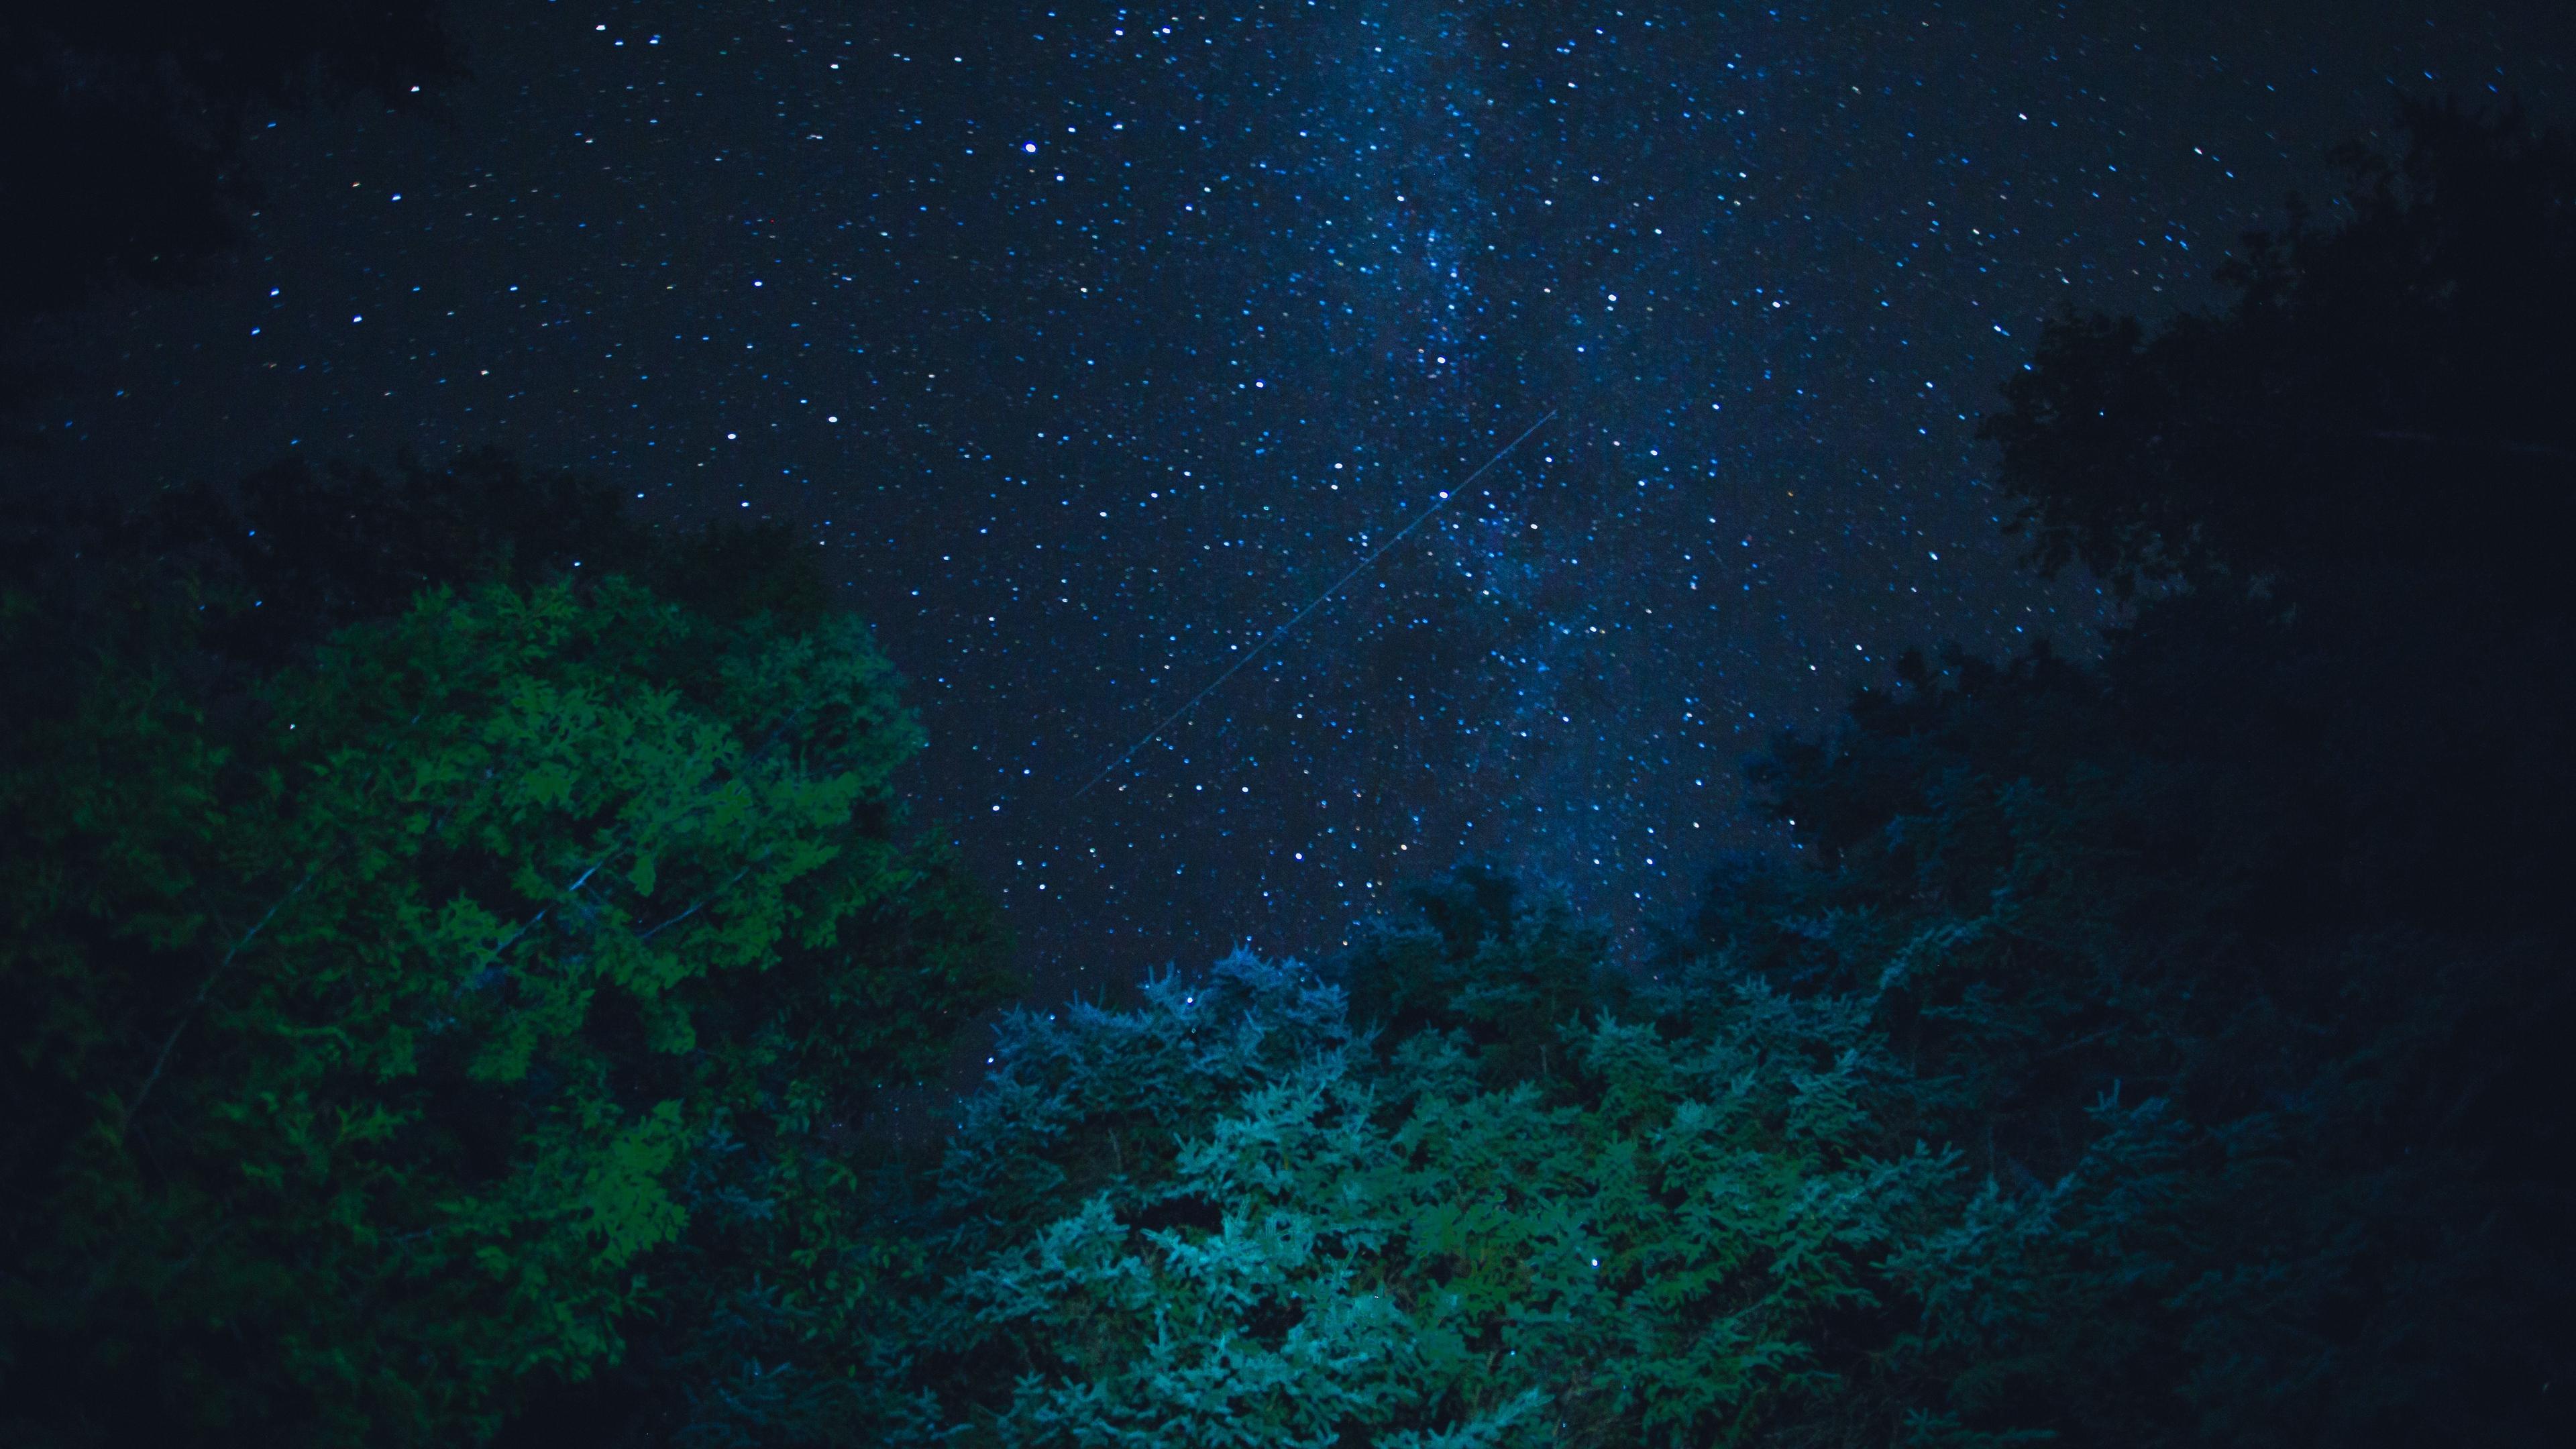 starry sky stars night trees 4k 1541114095 - starry sky, stars, night, trees 4k - Stars, starry sky, Night